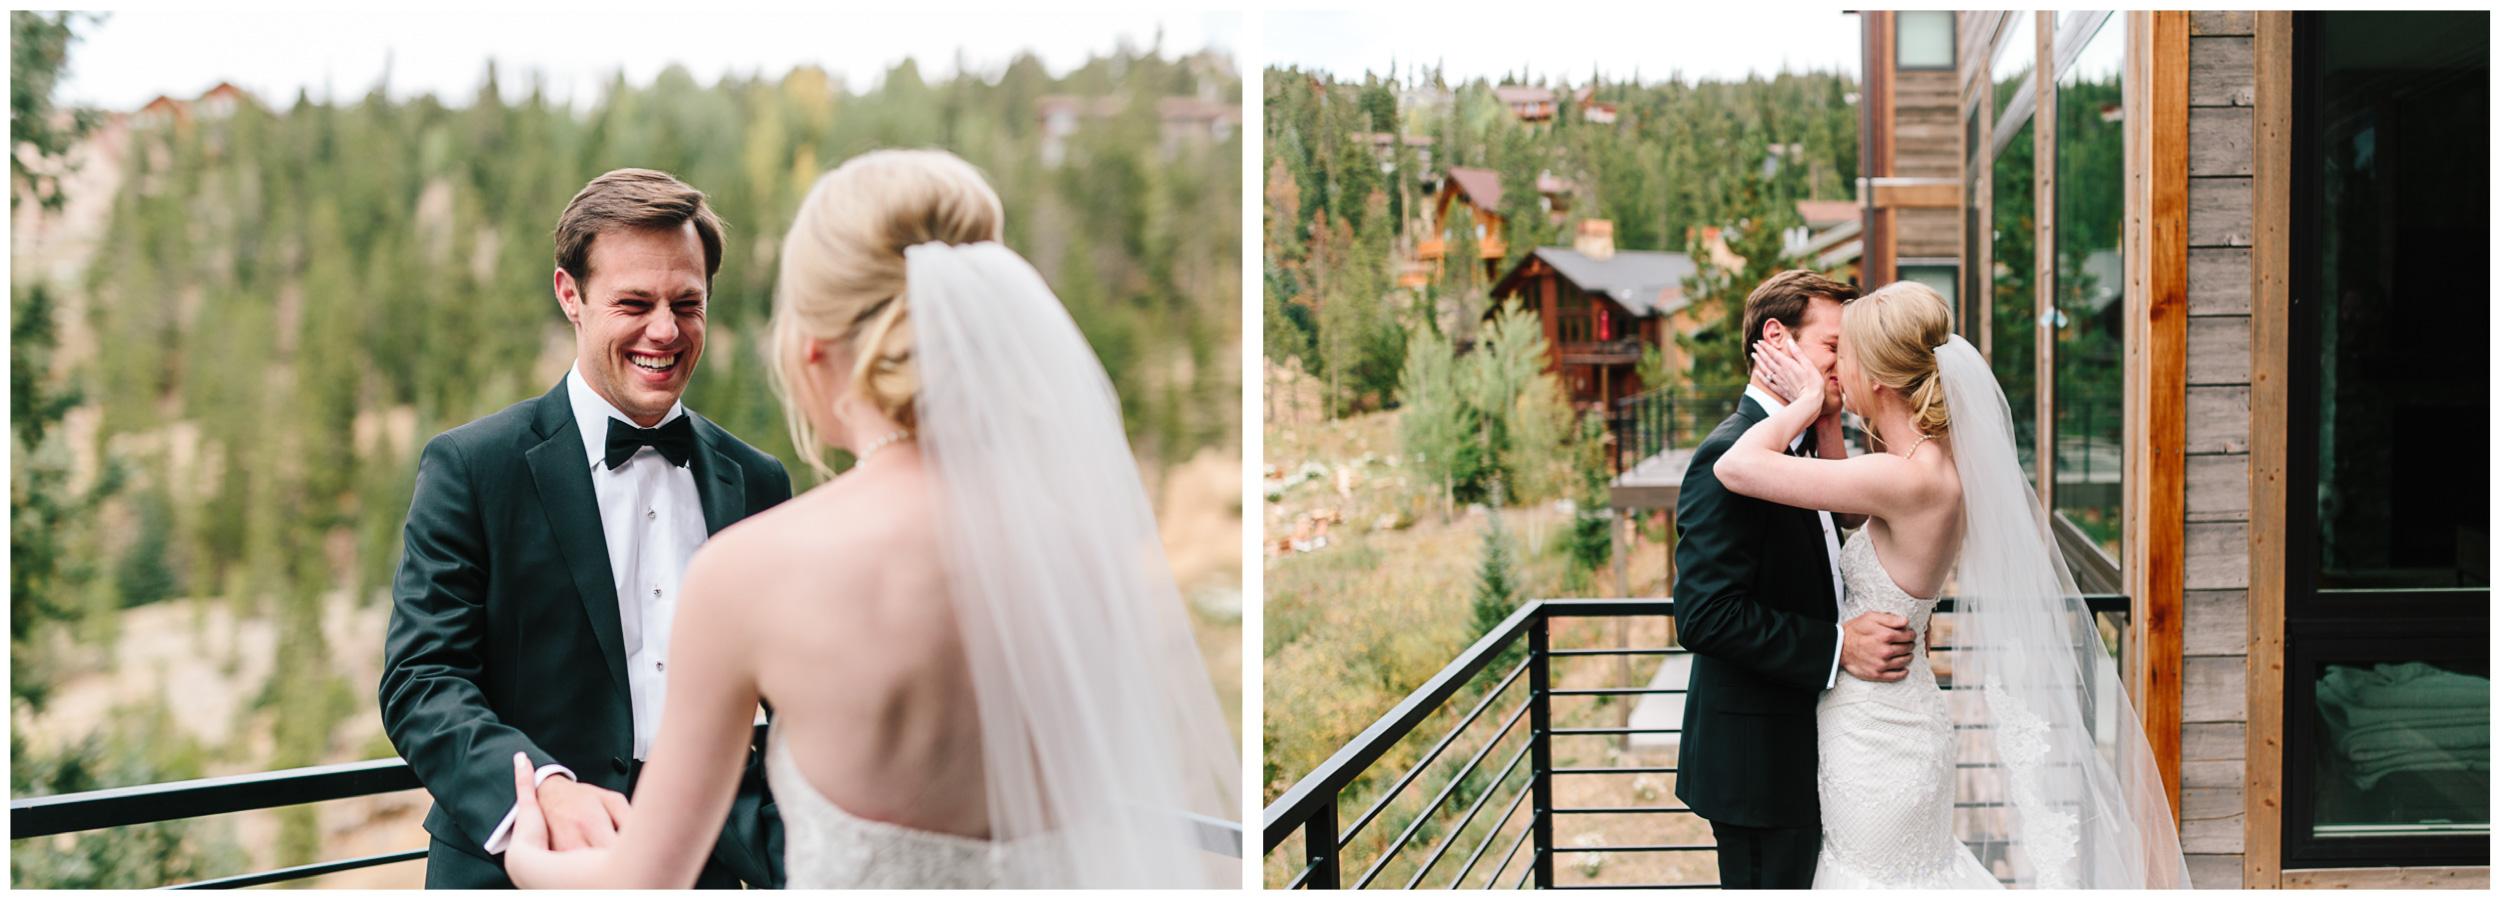 ten_mile_station_wedding_25.jpg